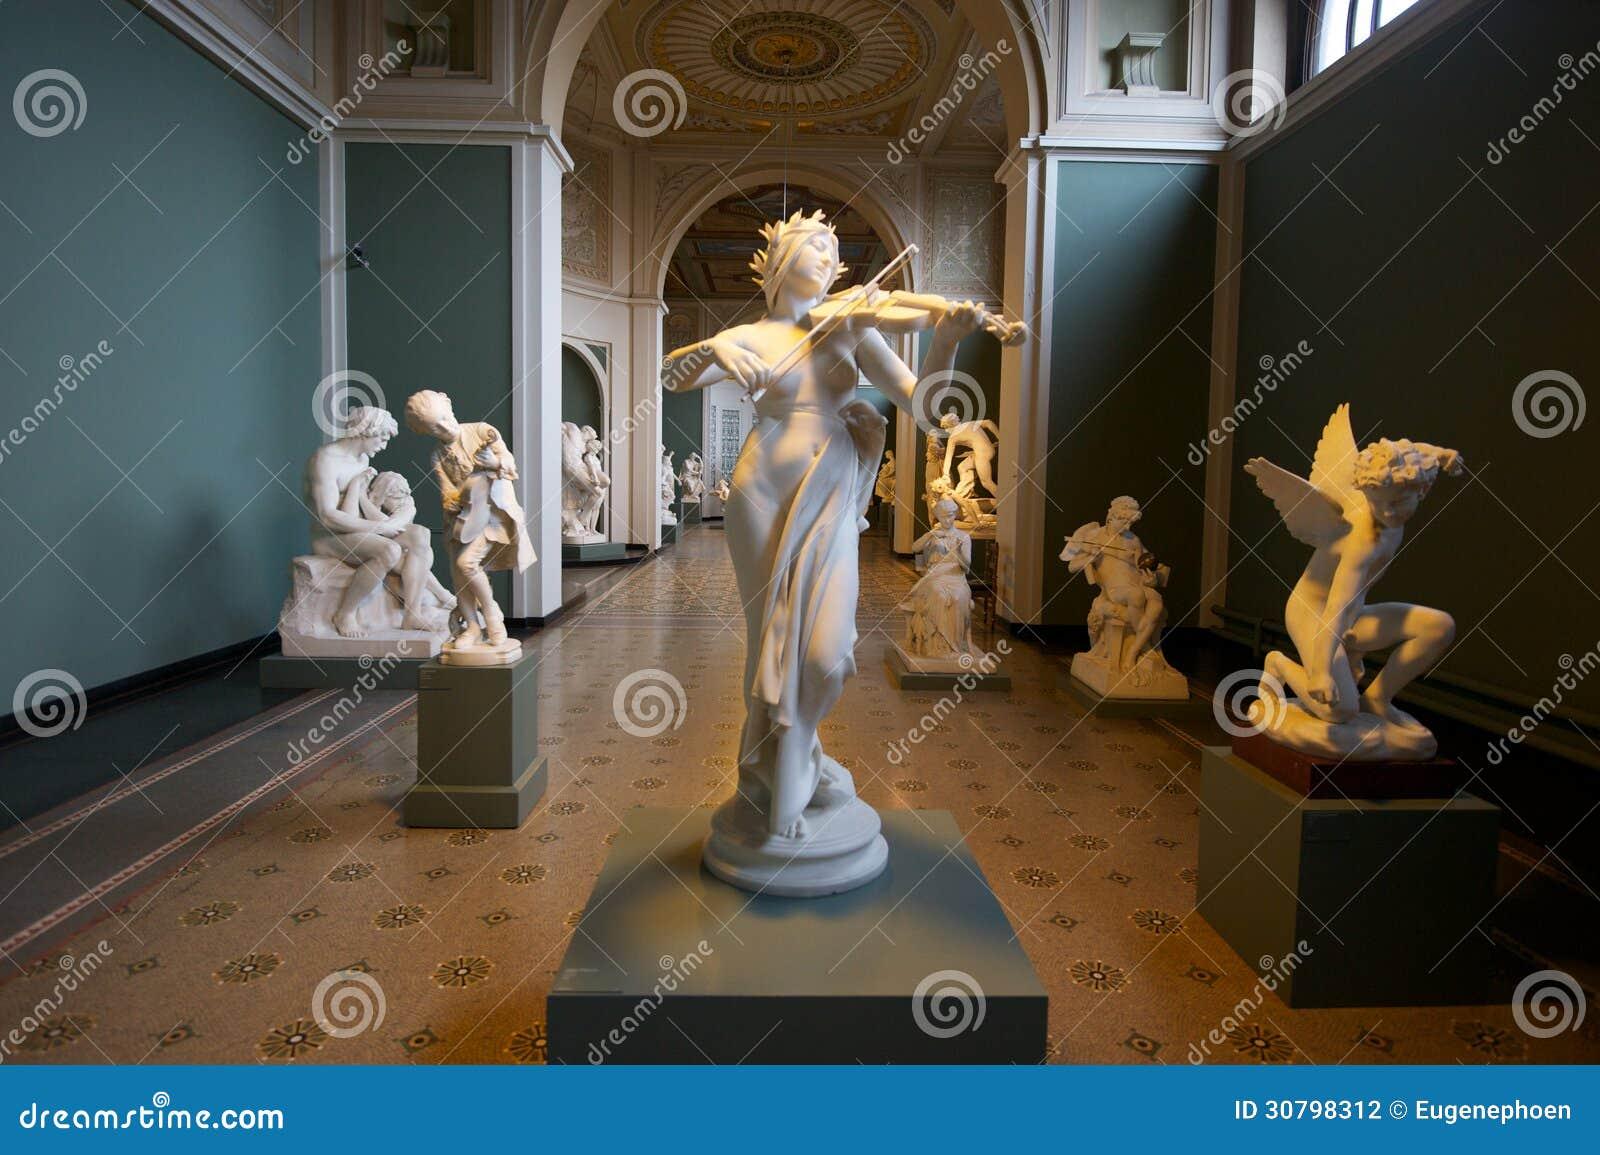 Greek Goddess Of Music Name The Image